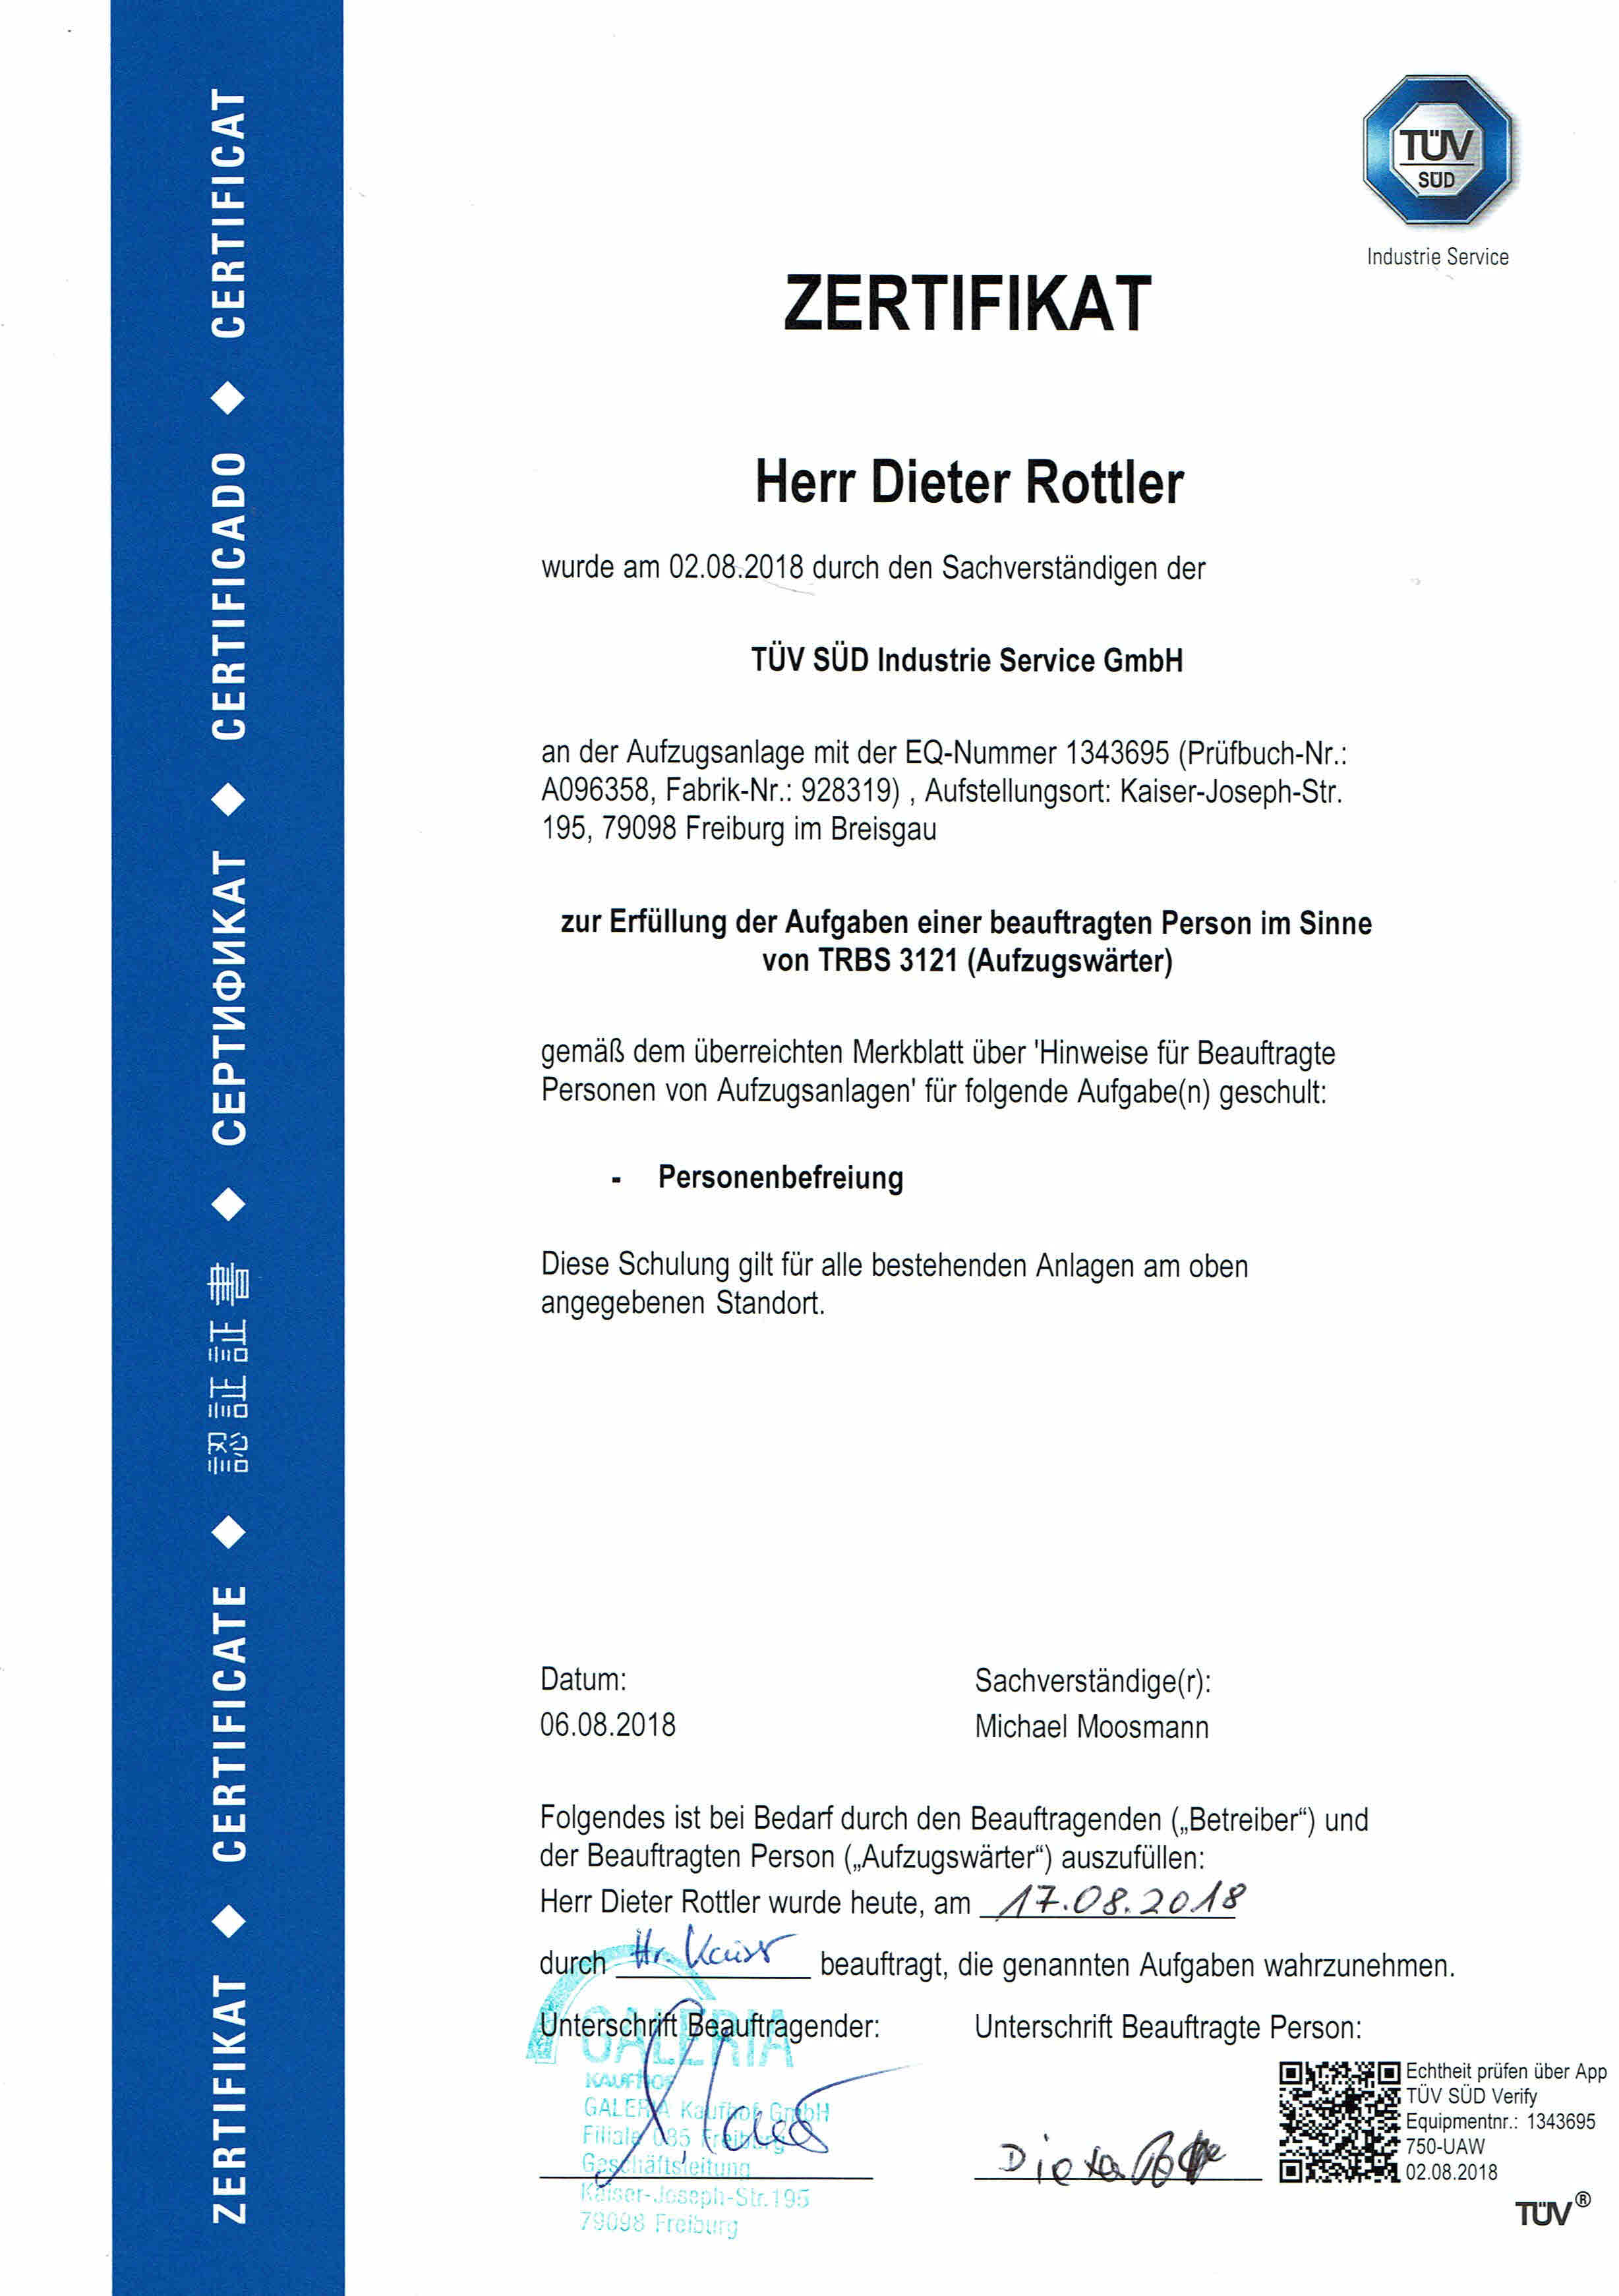 Zertifikat Aufzugswärter Galeria Kaufhof GmbH Freiburg